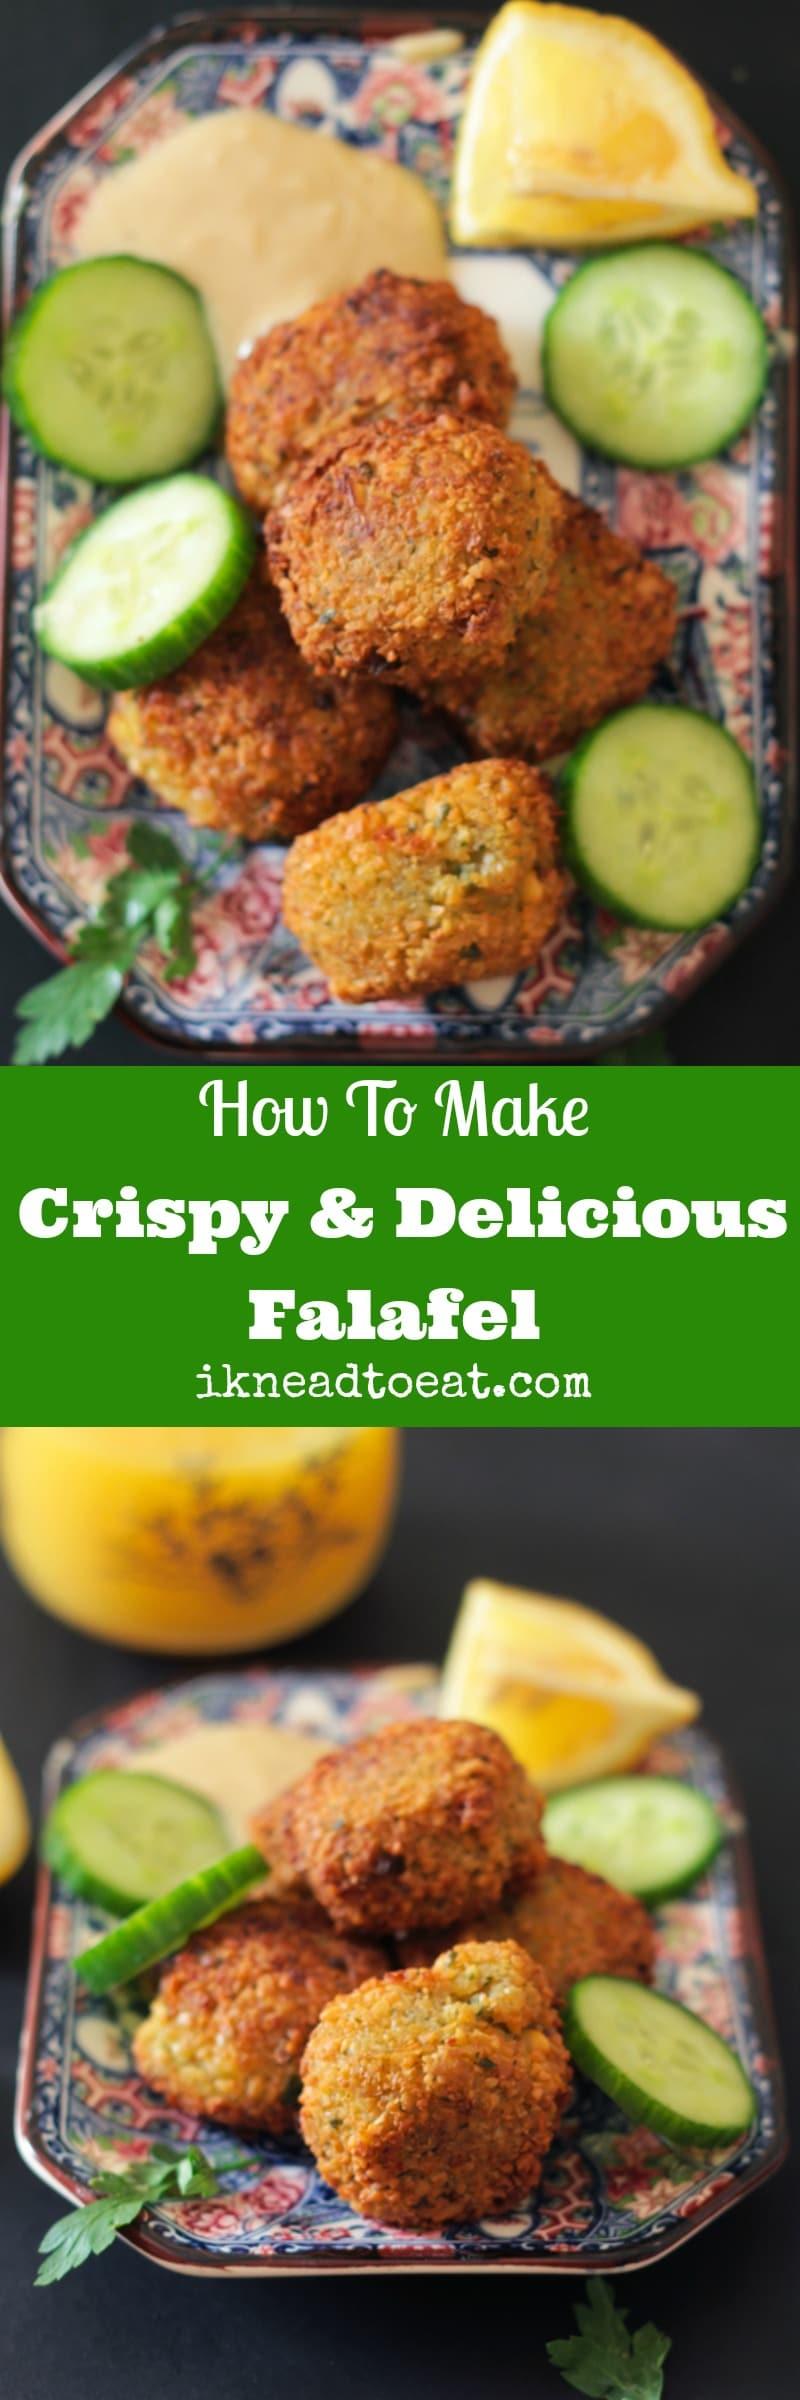 How to Make Crispy & Delicious Falafel